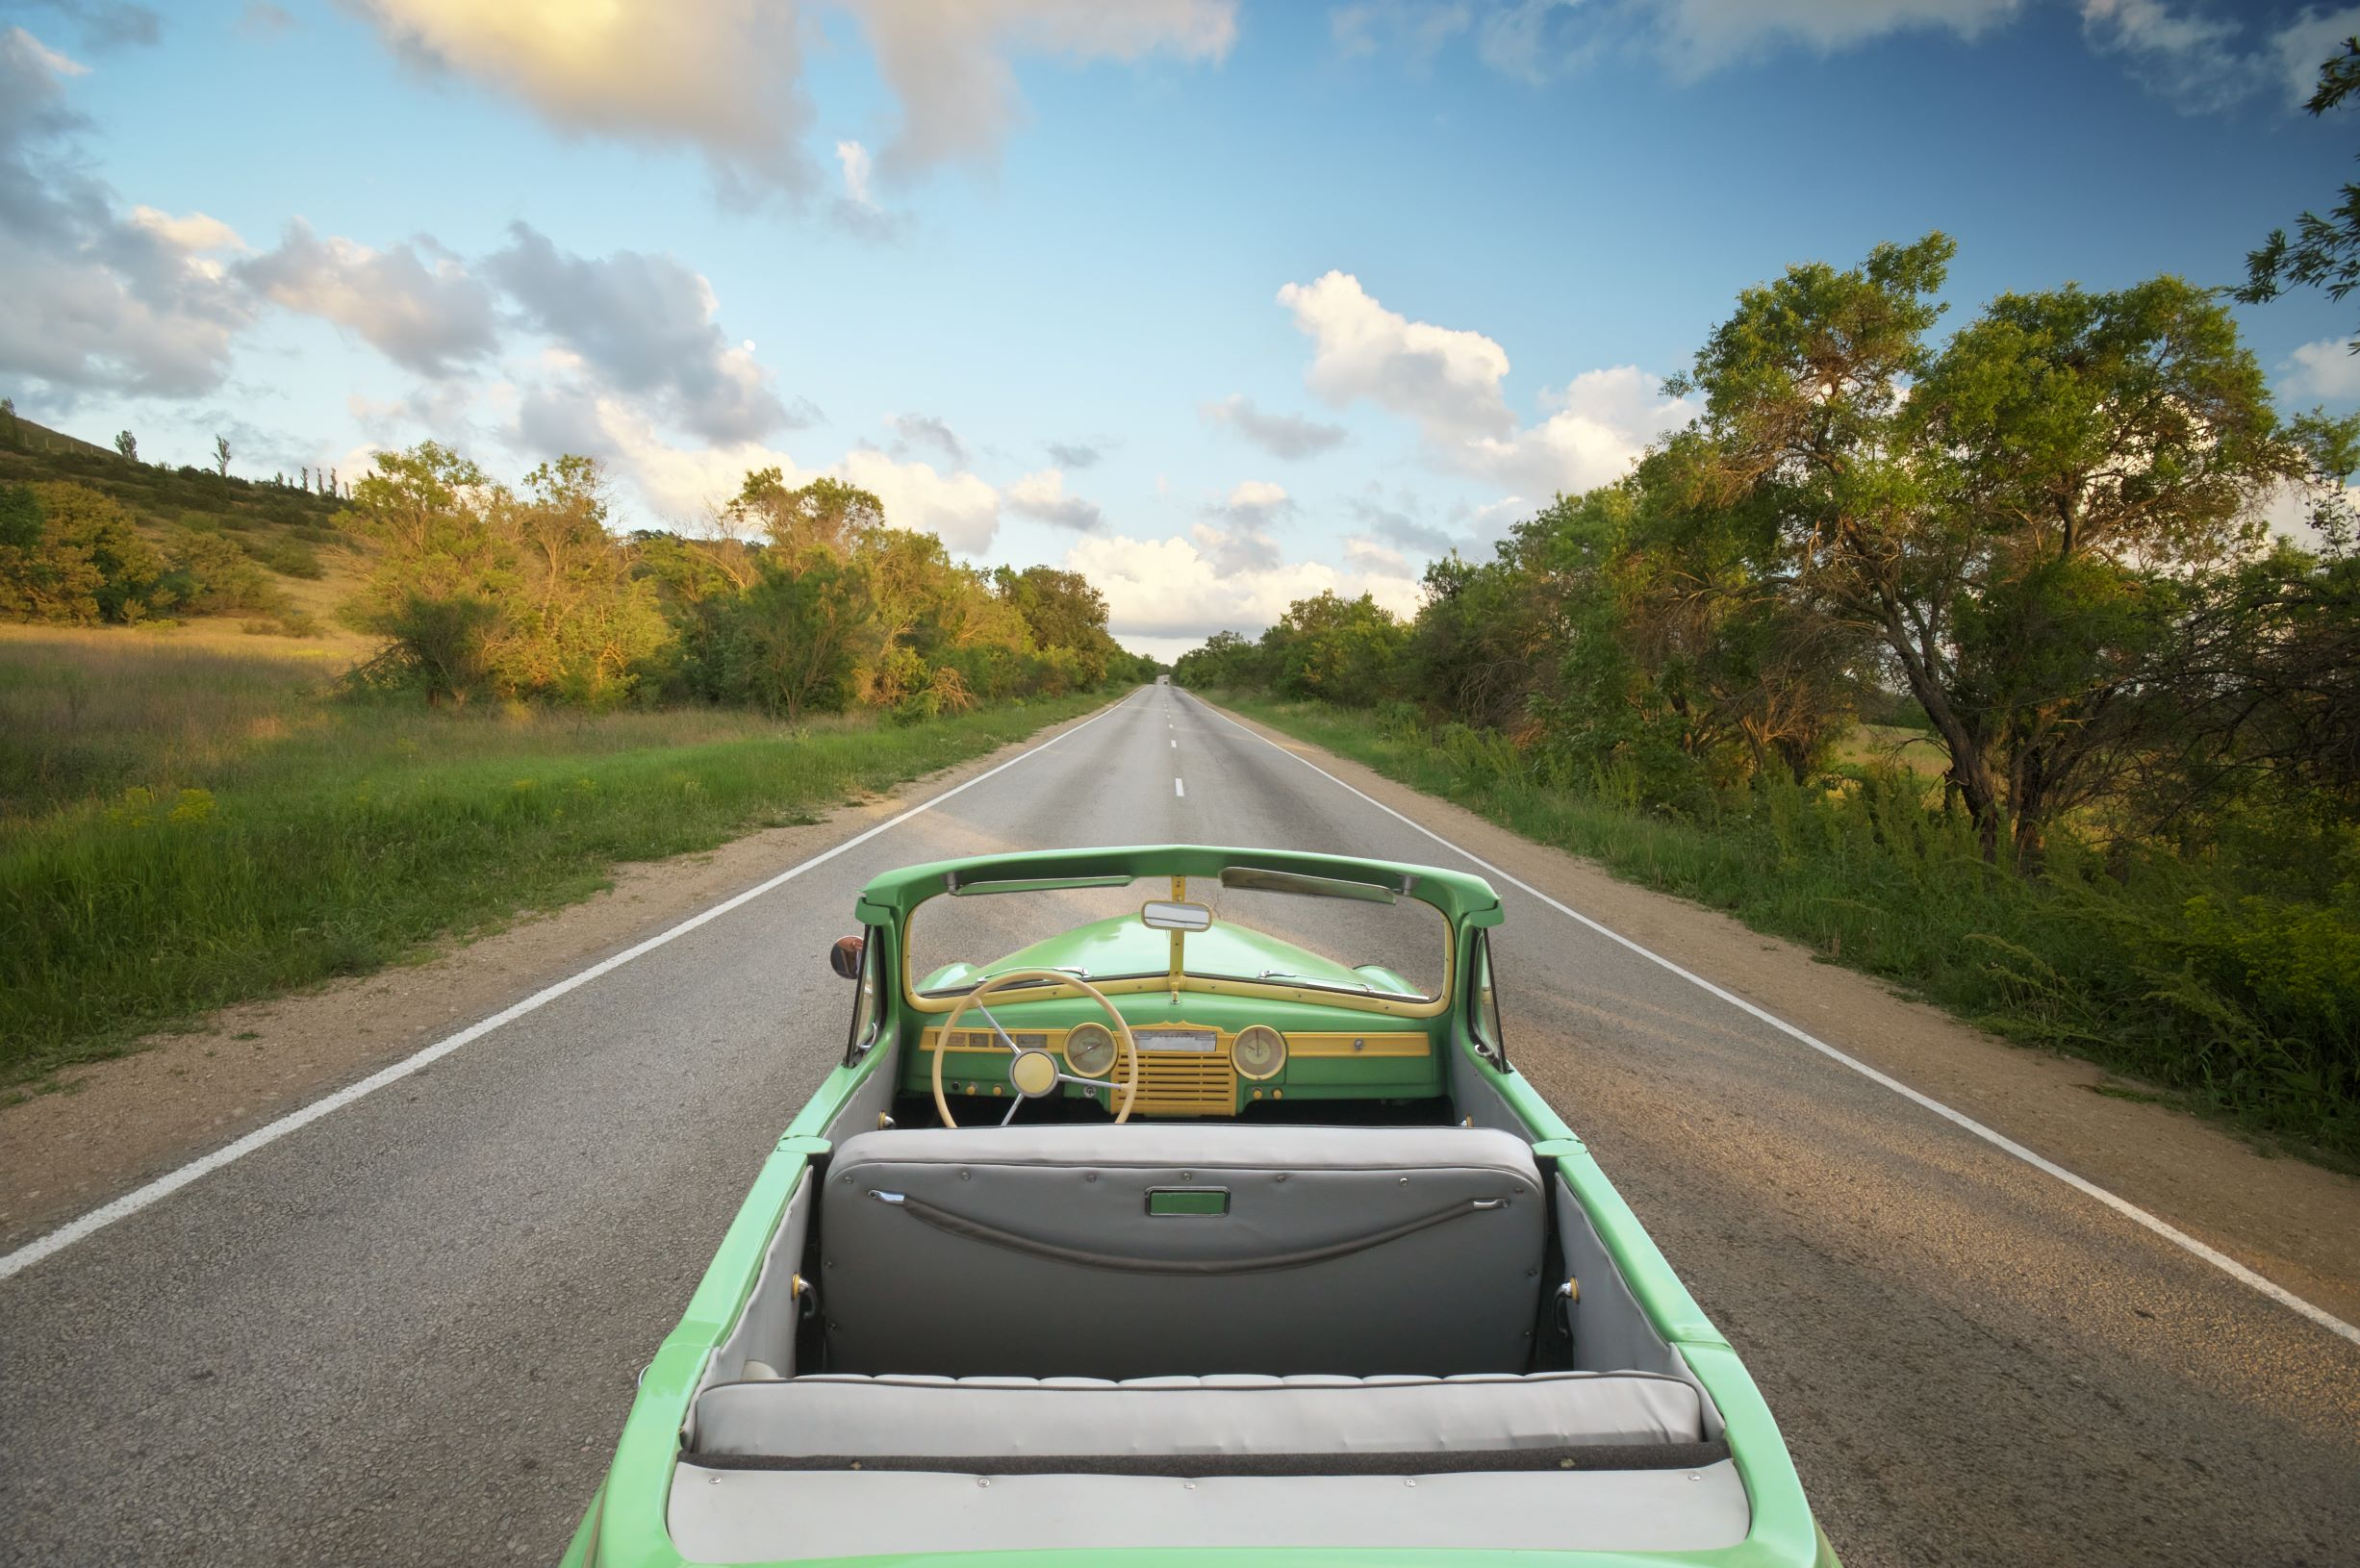 Green retro car on empty road